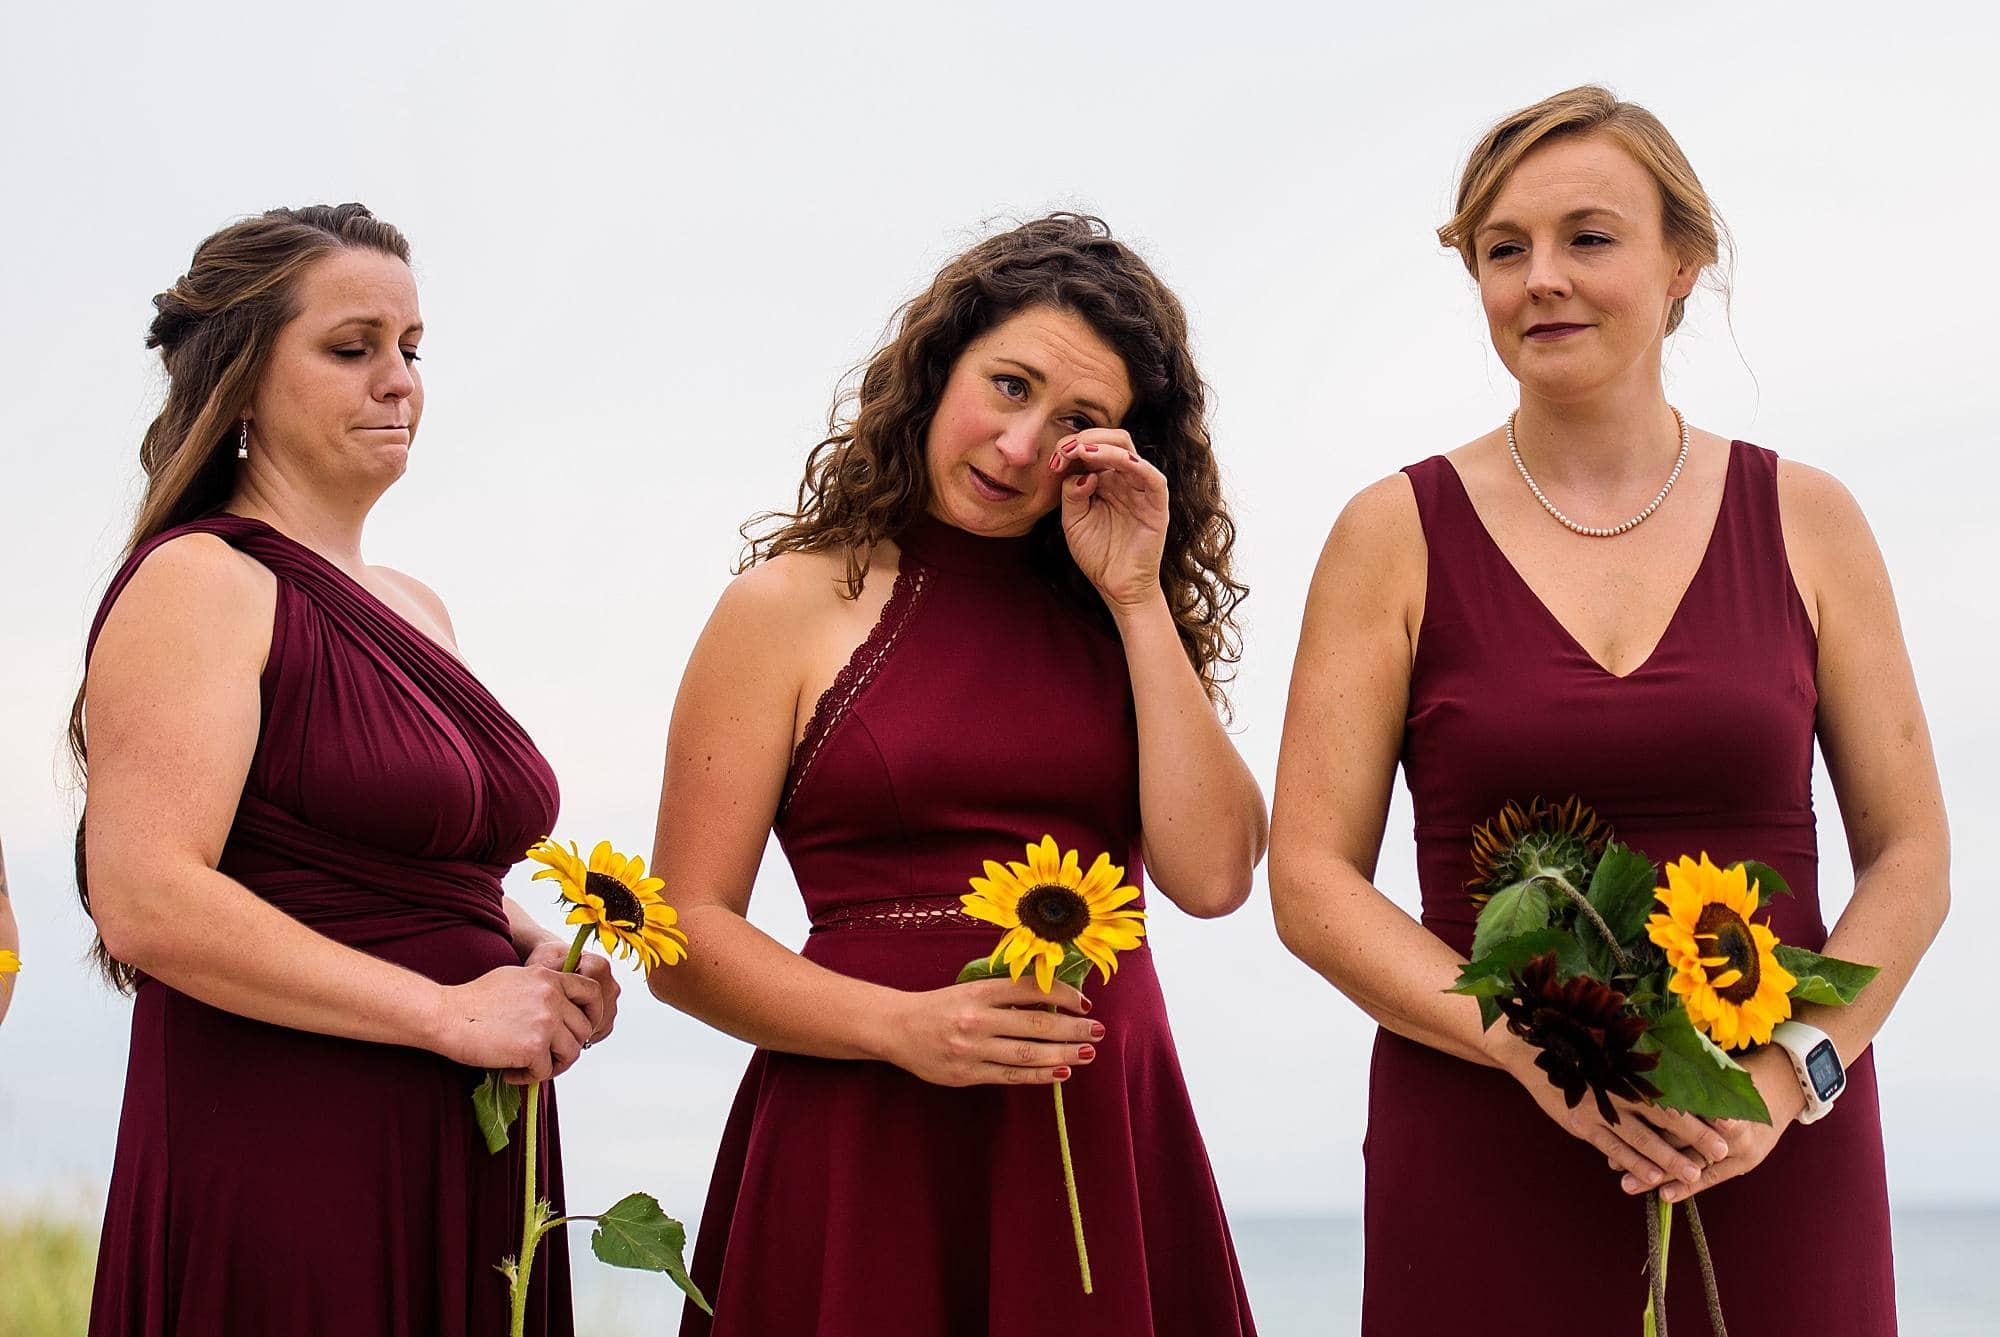 bridesmaid wiping tears during wedding